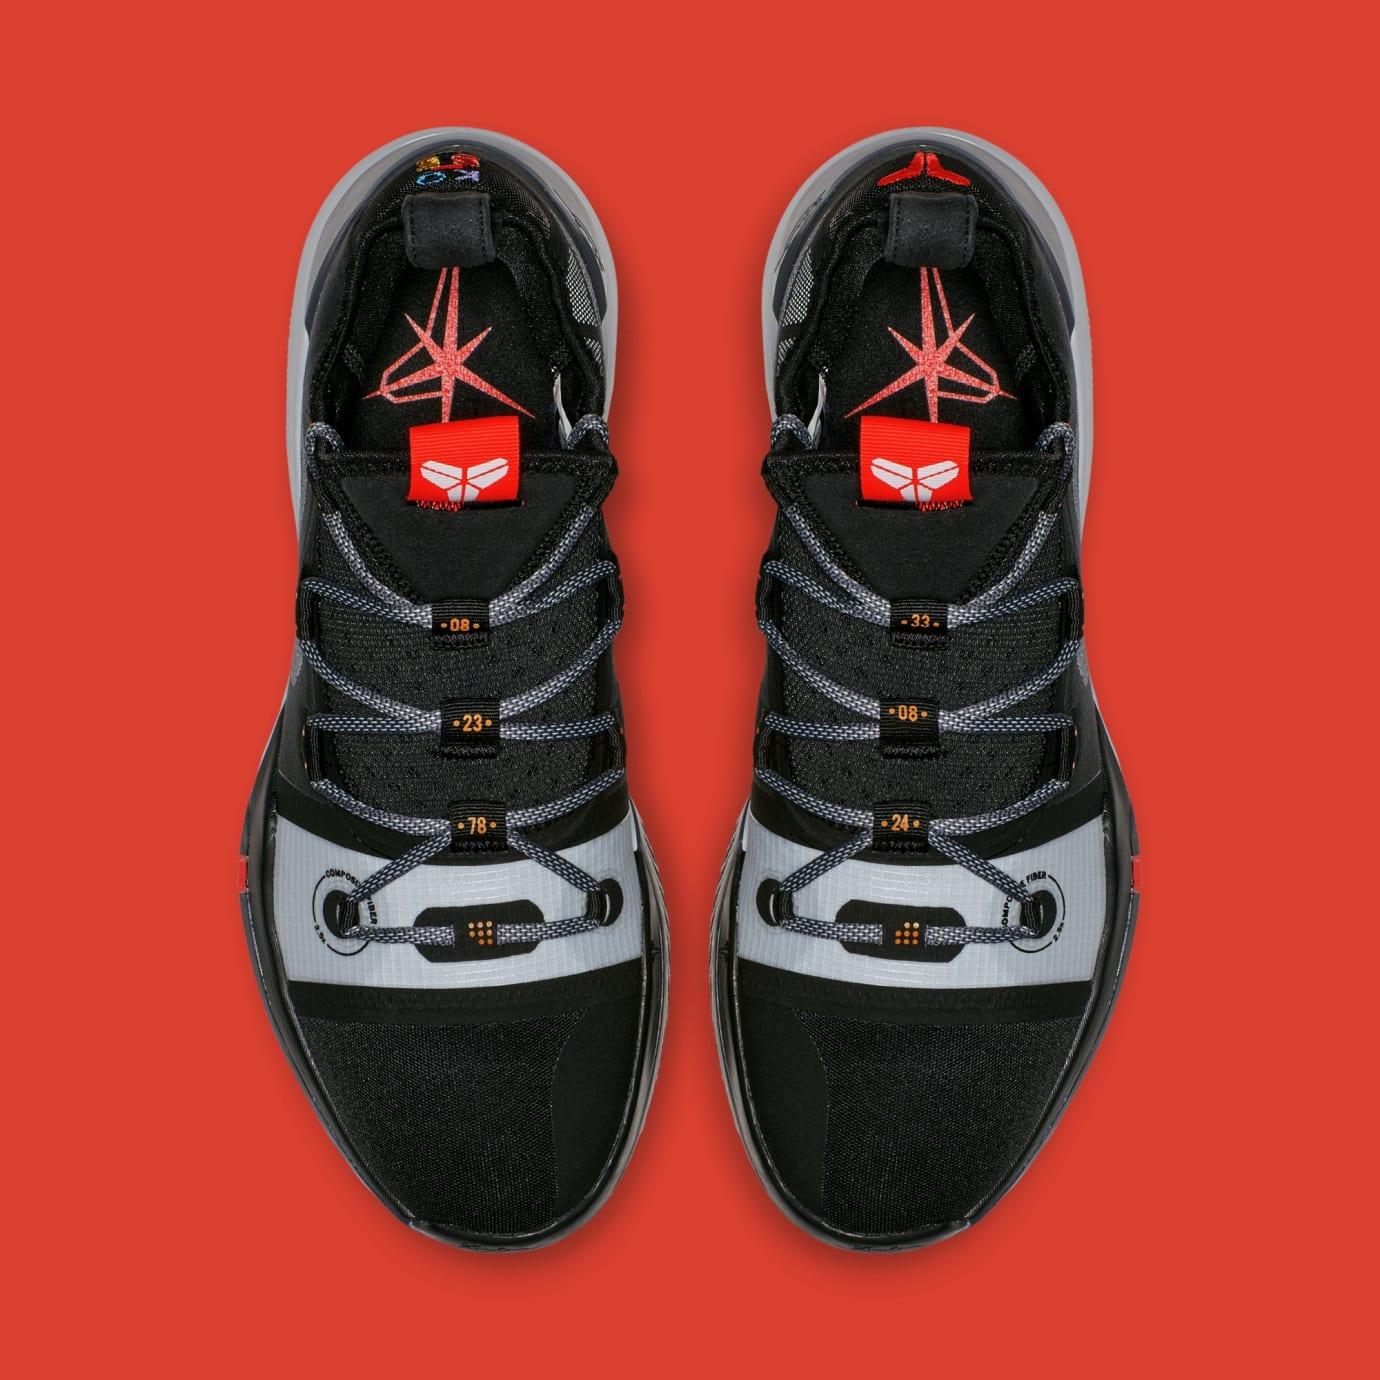 bc61b3717a51 Image via Nike Nike Kobe AD  Black Multi  AV3555-001 (Top)